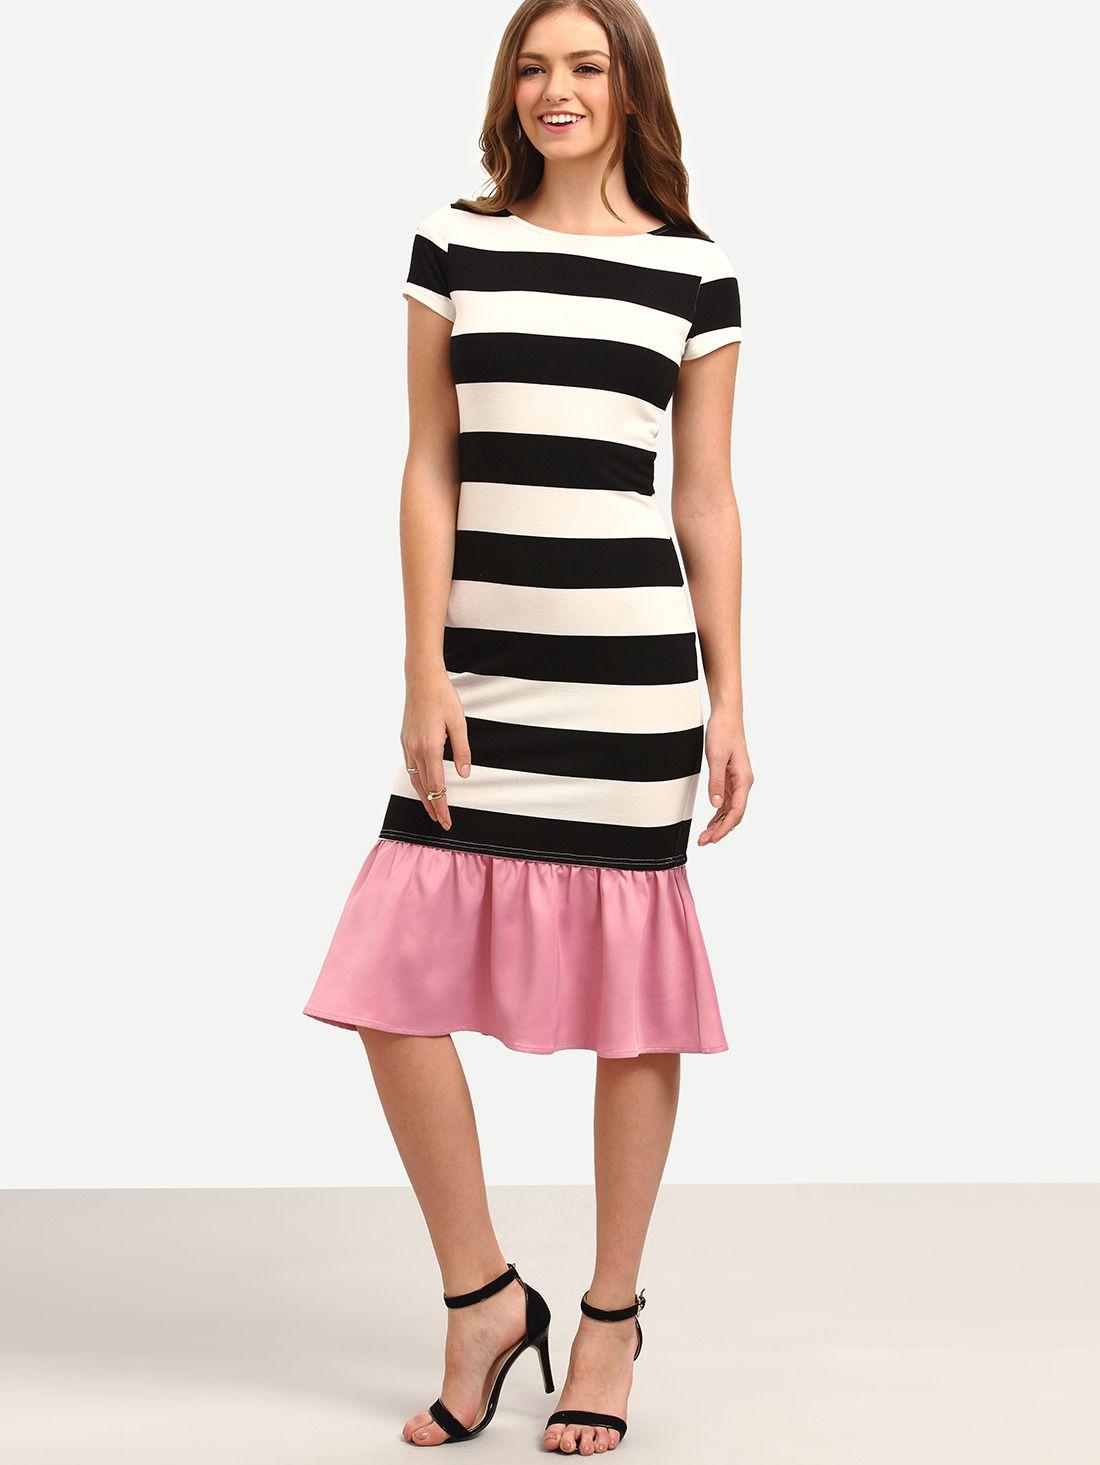 Black White Striped Patchwork Ruffle Midi Dress 20.99  a45ae29b7